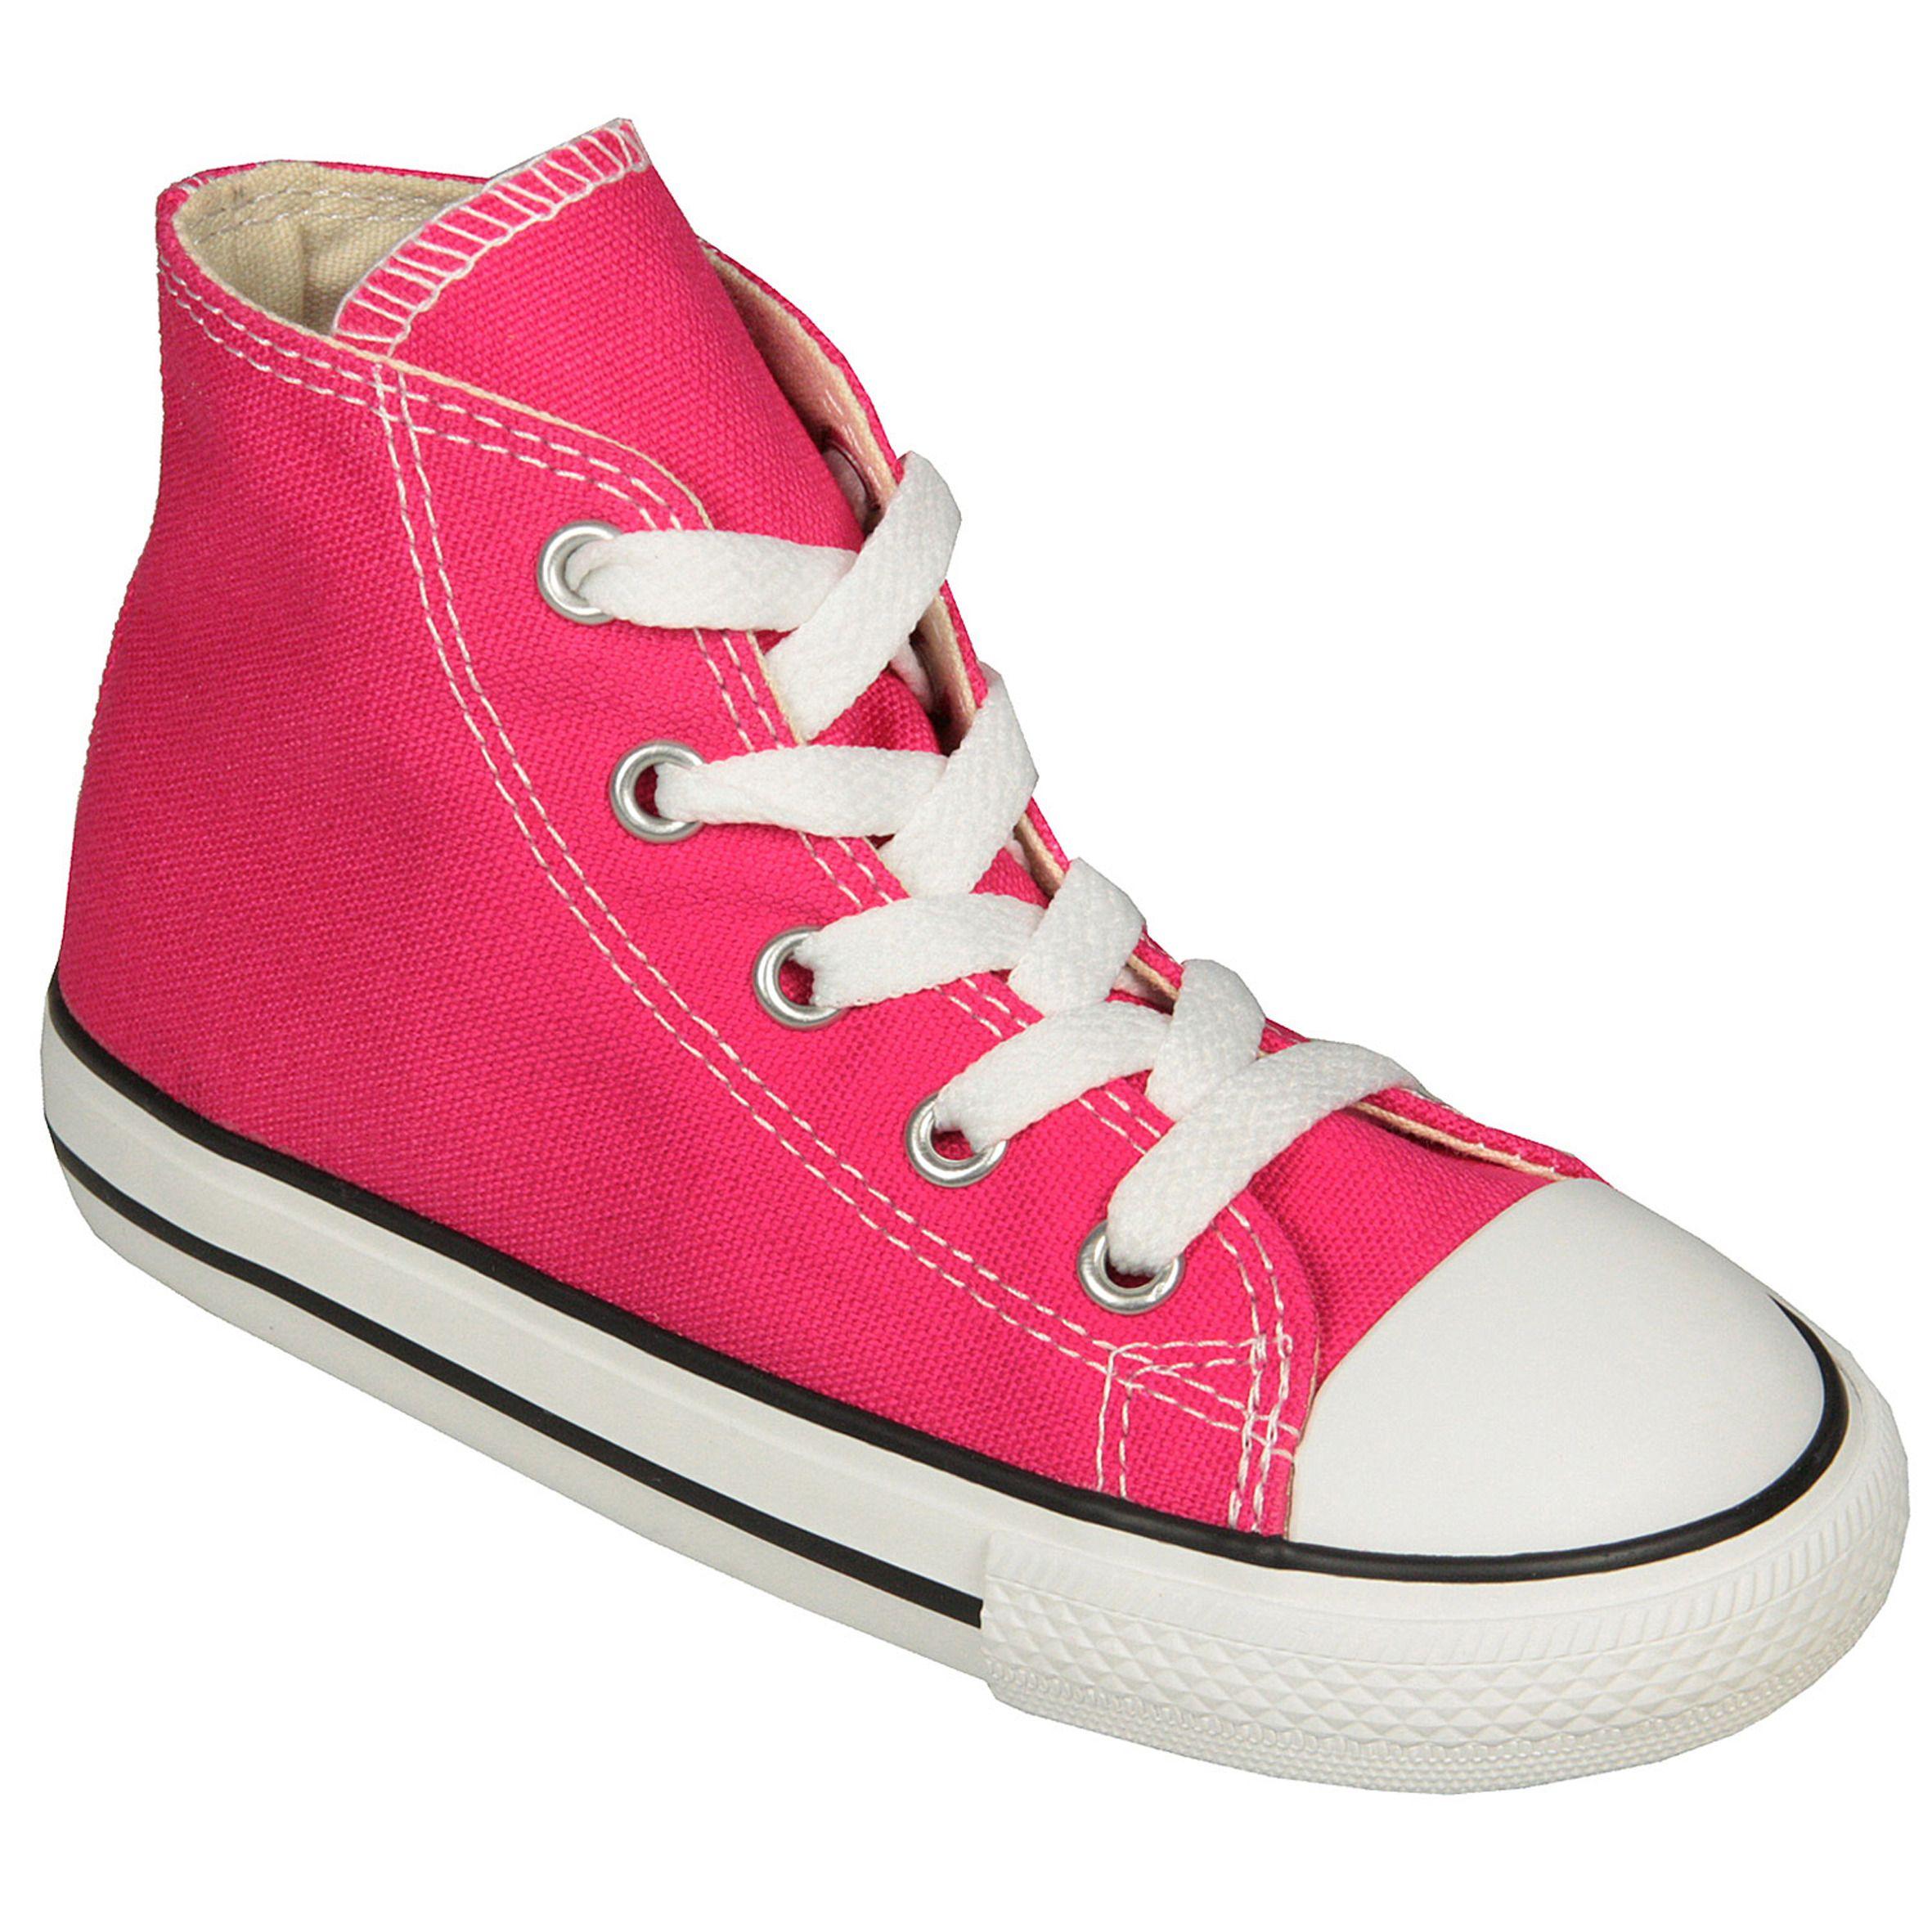 Girls converse, Converse chuck taylor